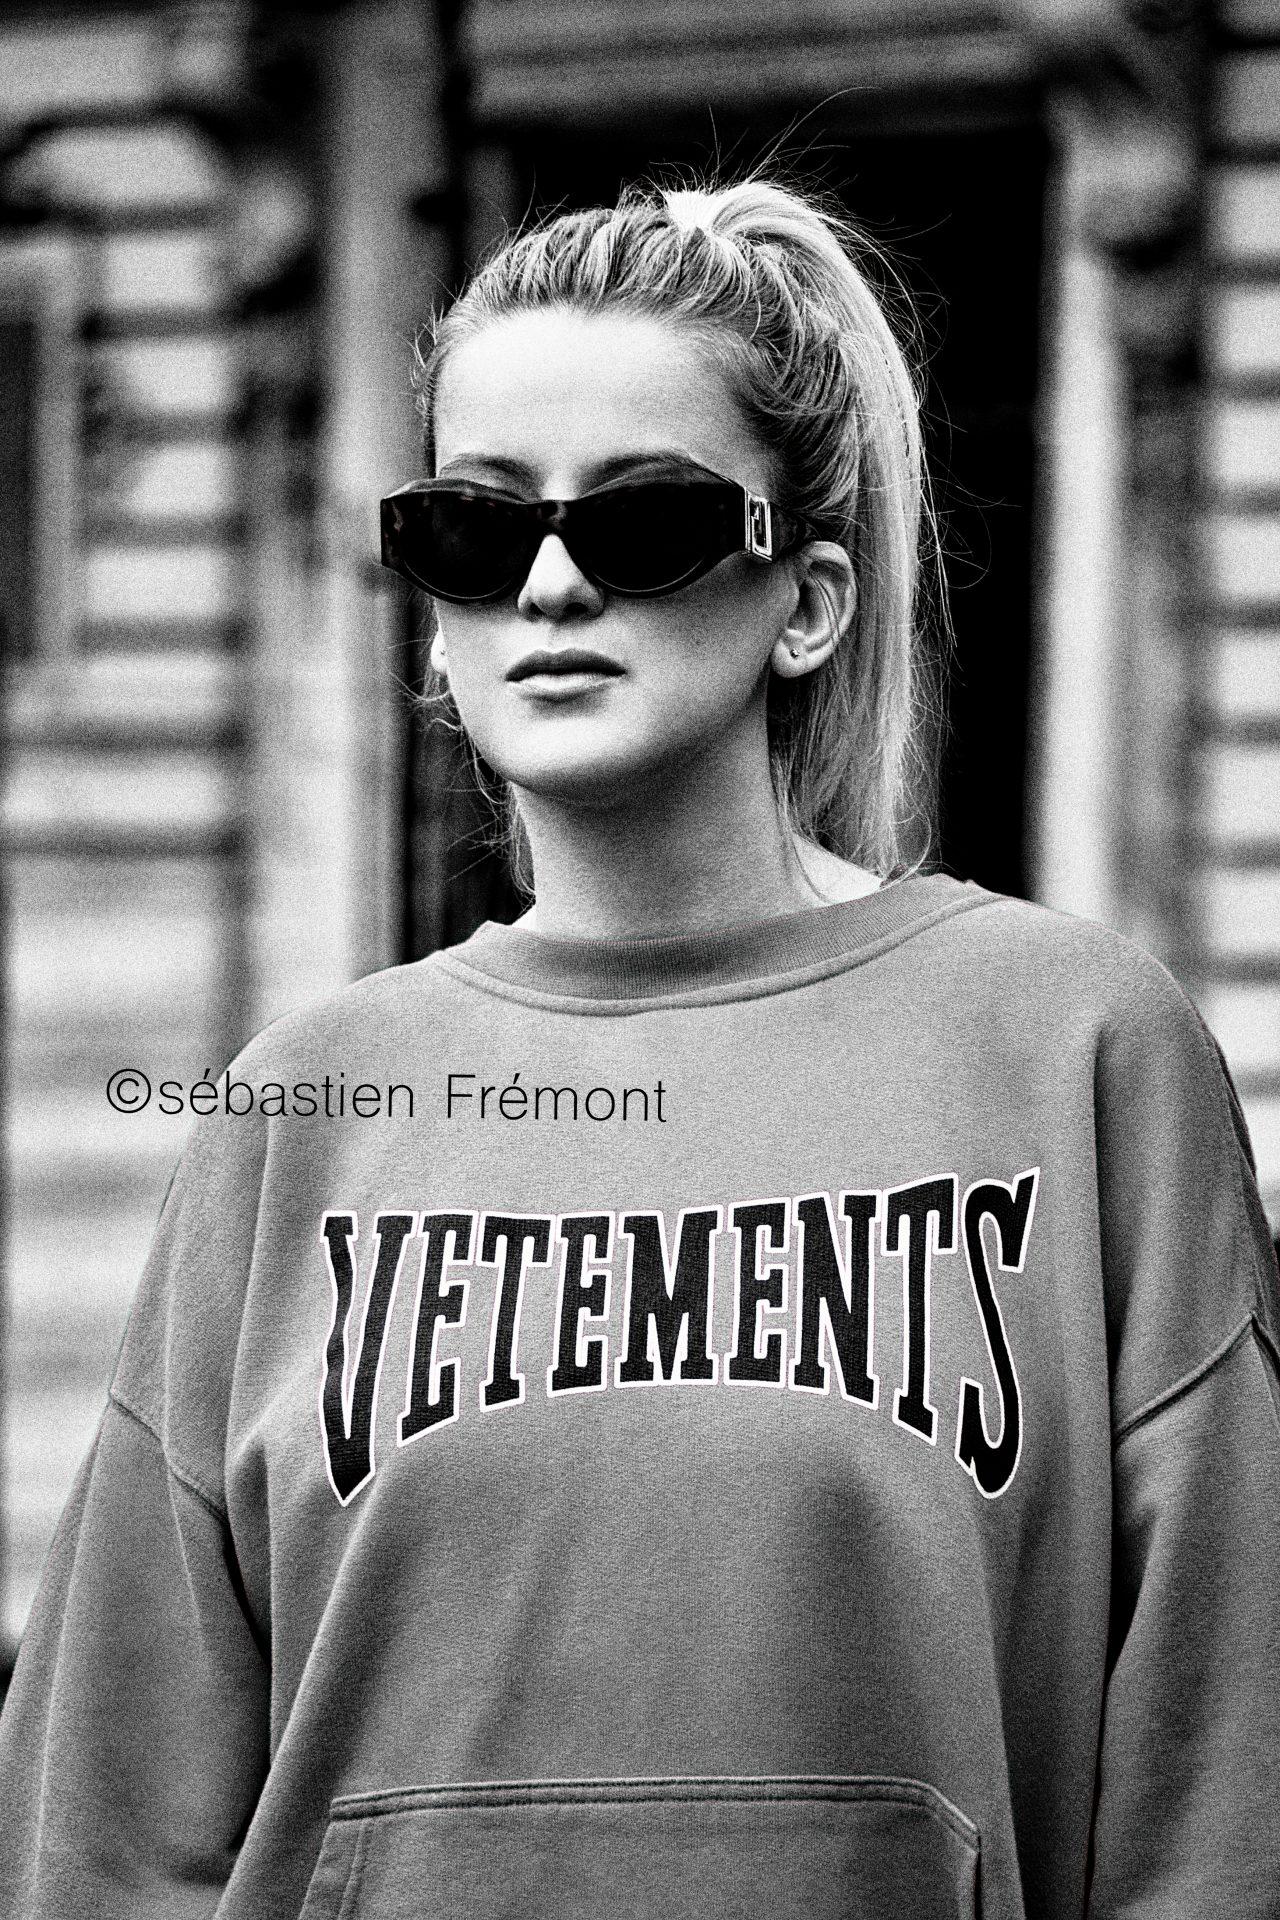 French Photographer Fashion Photography Vetements / Palina Kozyrava